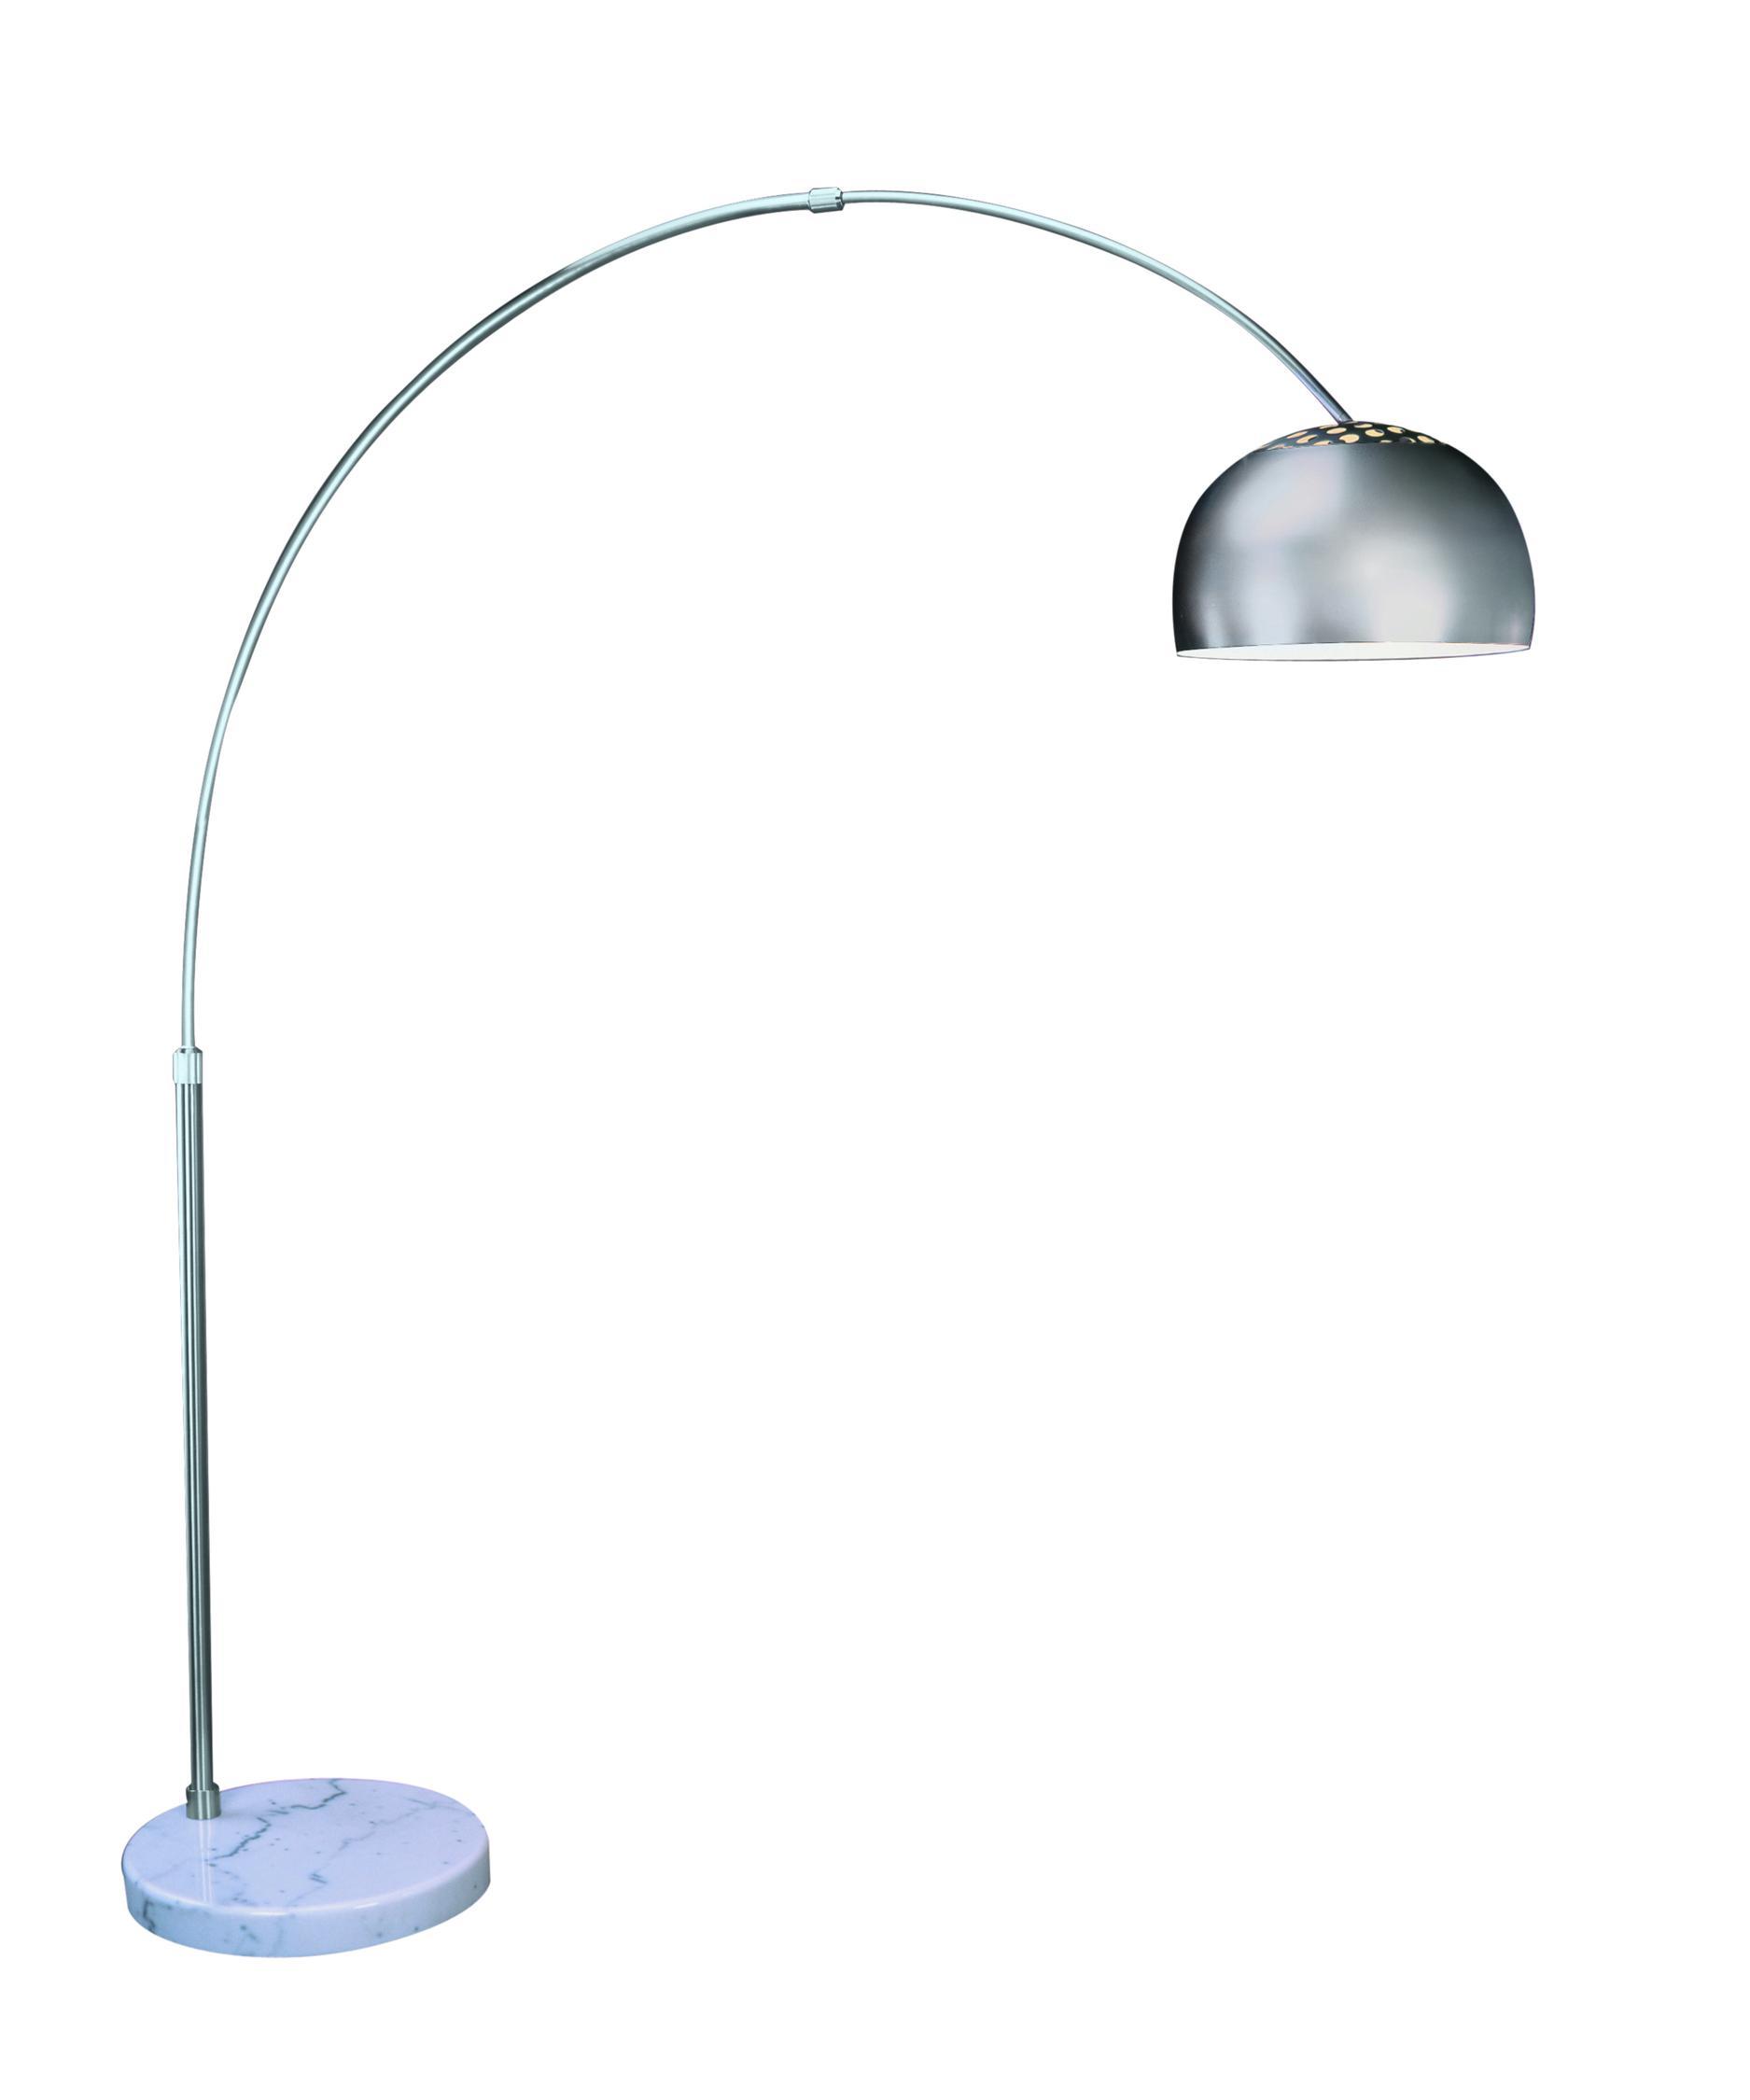 Trend Lighting TFA9005 Big Arc 95 Inch High Arc Lamp